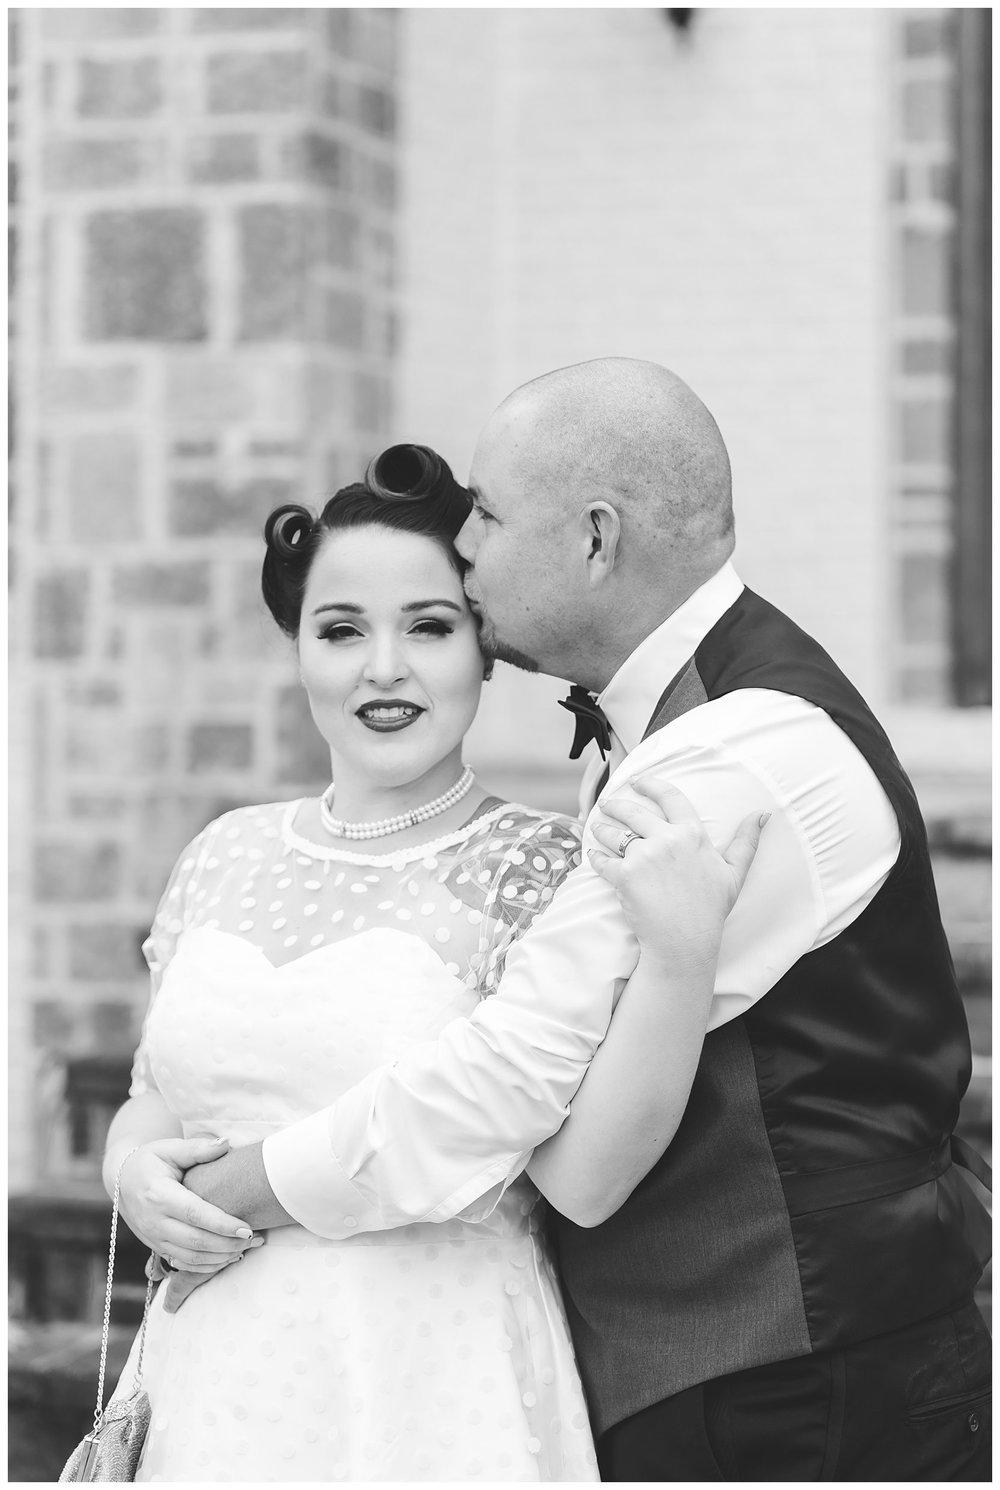 Charleston-South-Carolina-Wedding-Photographer-Engagement-Photography-green-eco-friendly-stephanie-kopf-photography-54.jpg